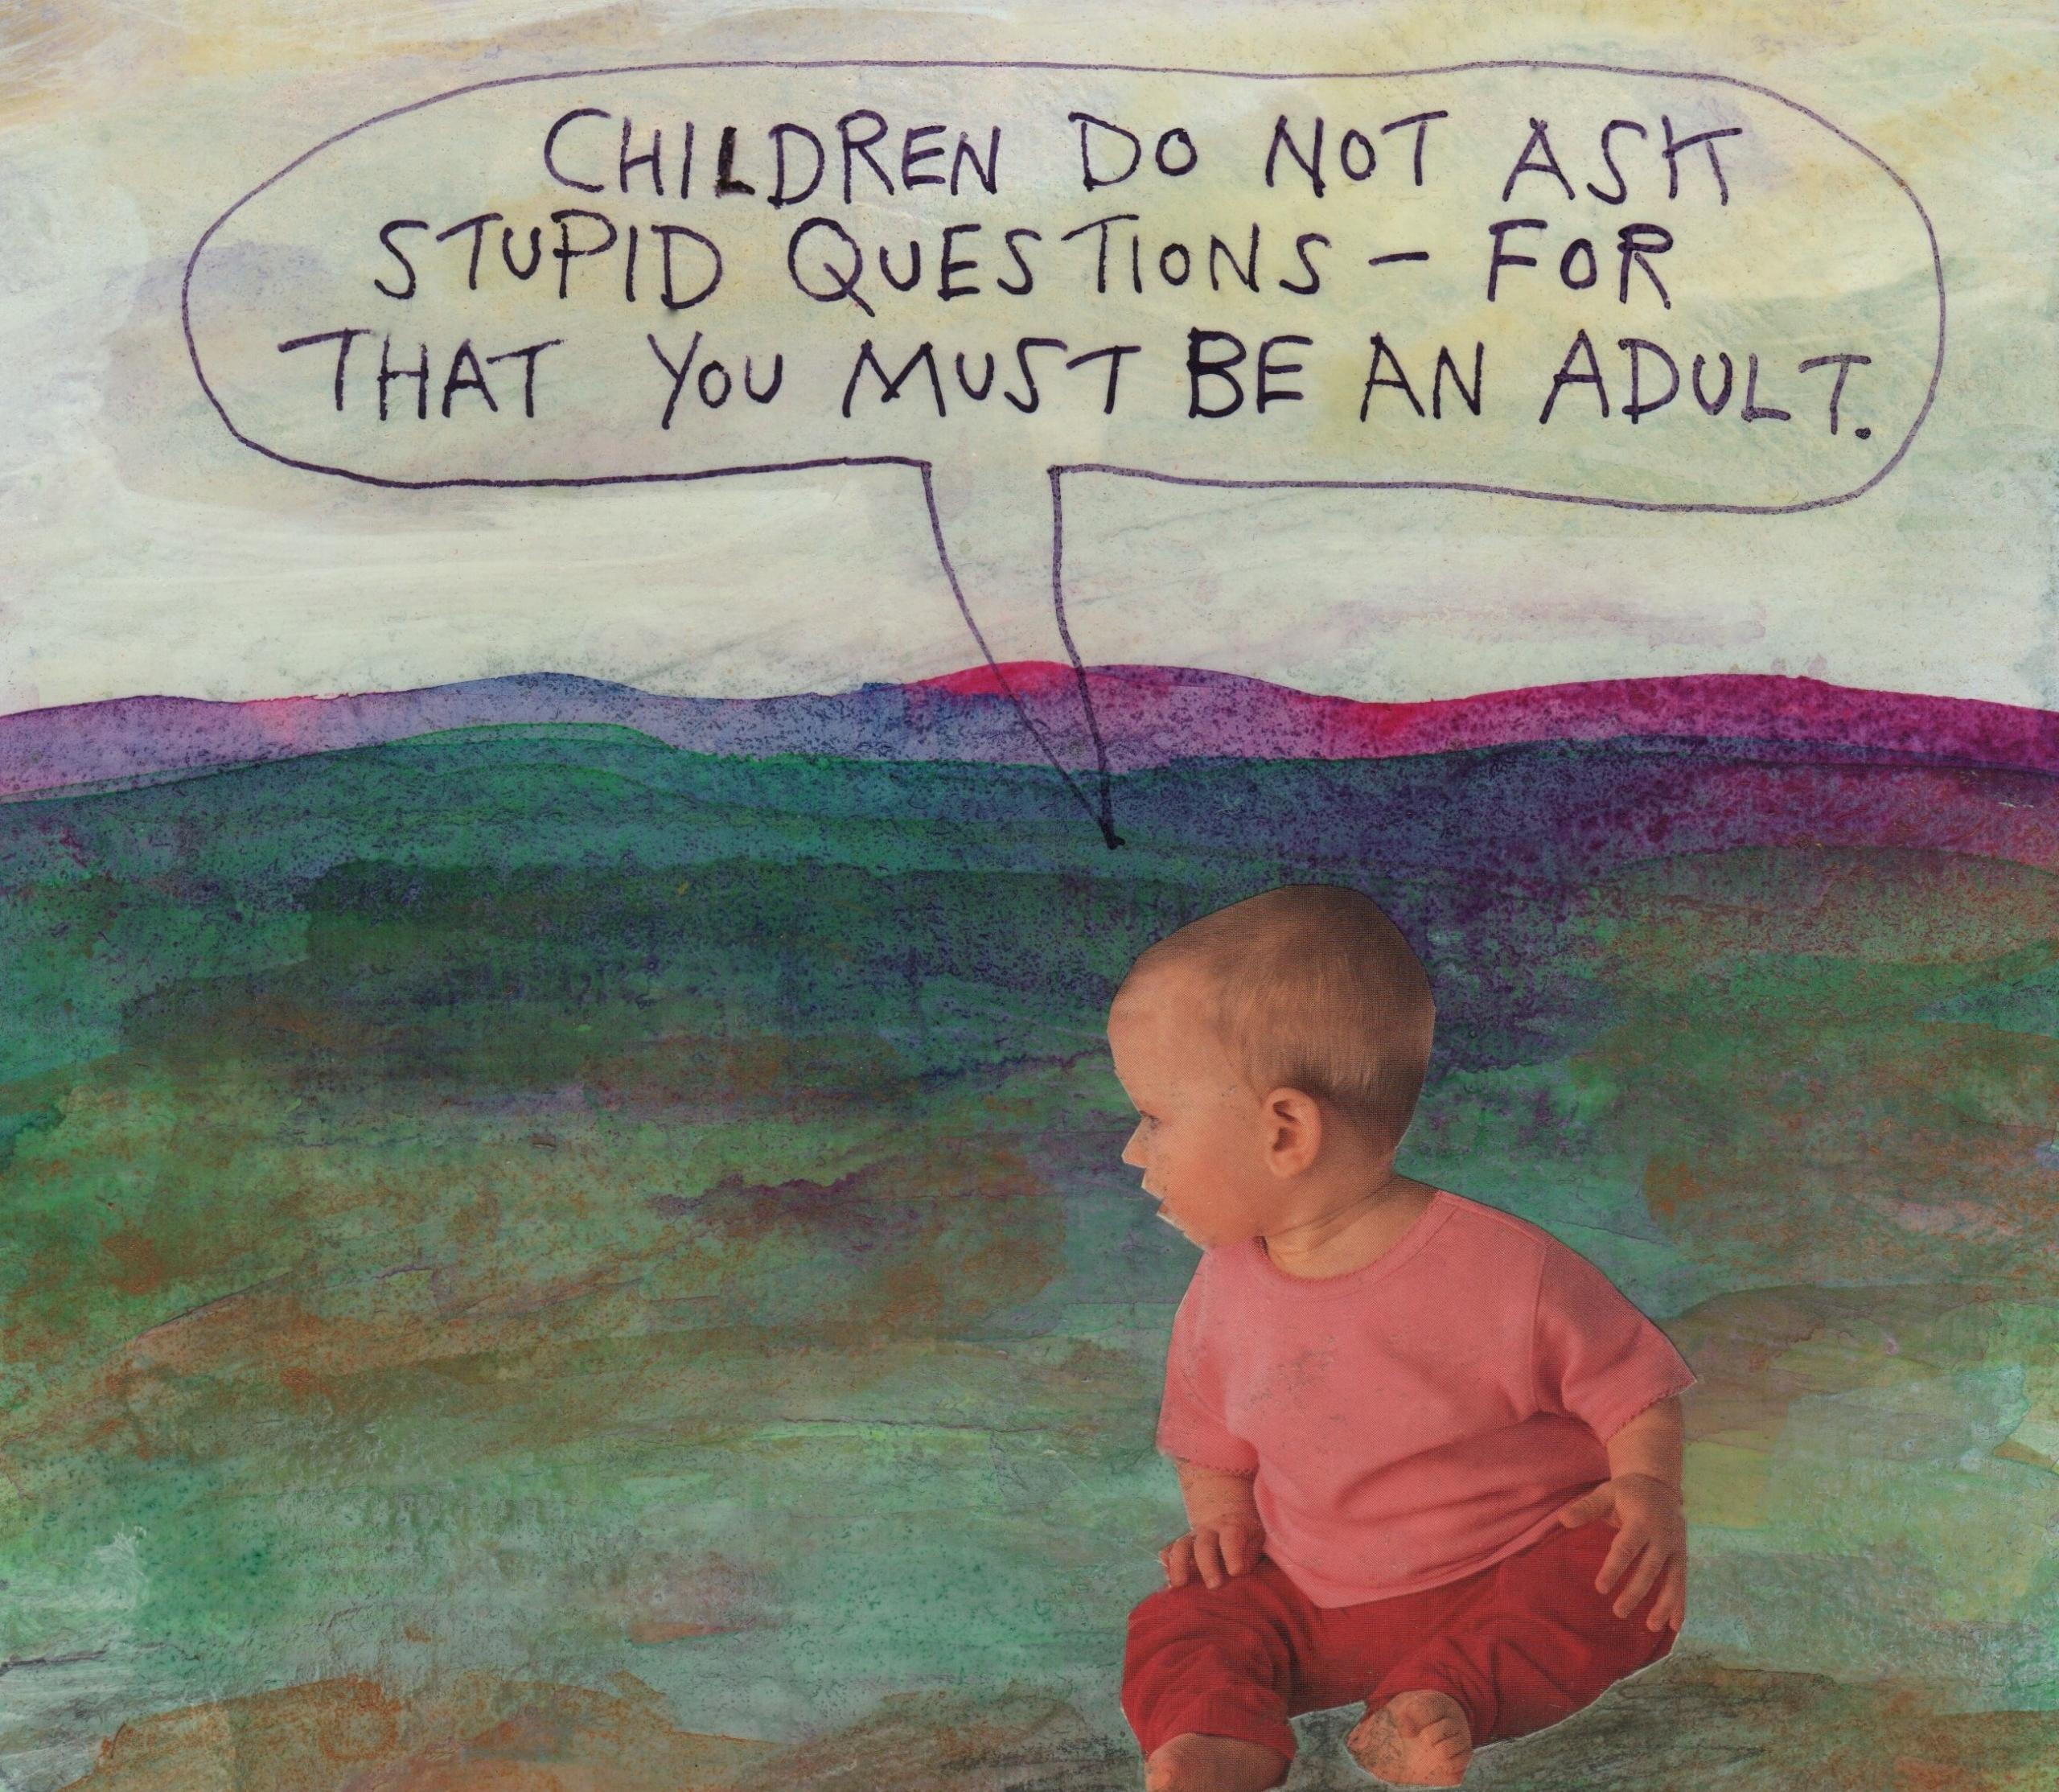 children stupid questions - stoicmike | ello